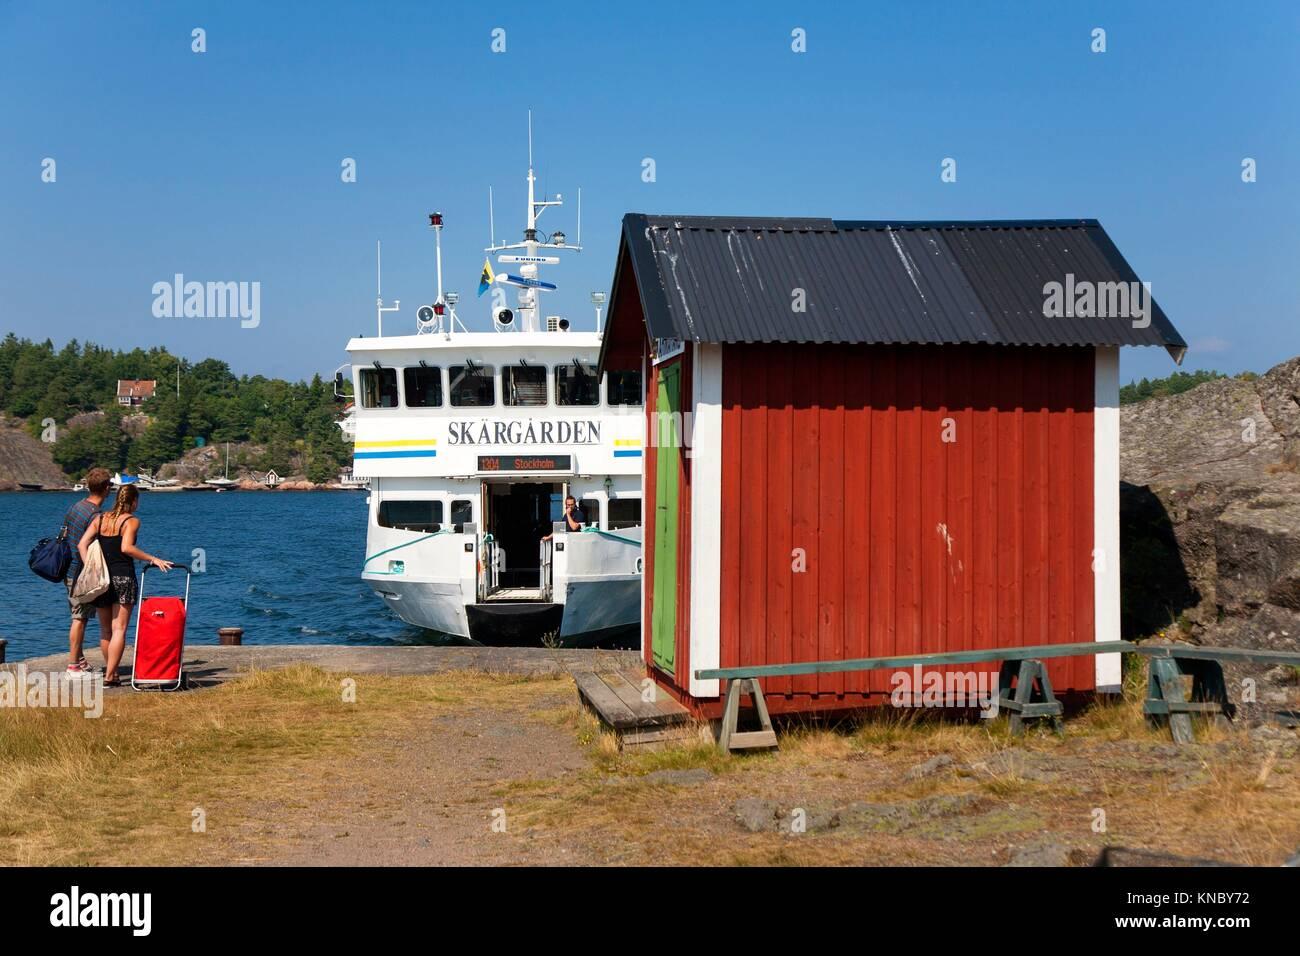 Passenger boat arriving at port, Swedish archipelago near Stockholm. - Stock Image